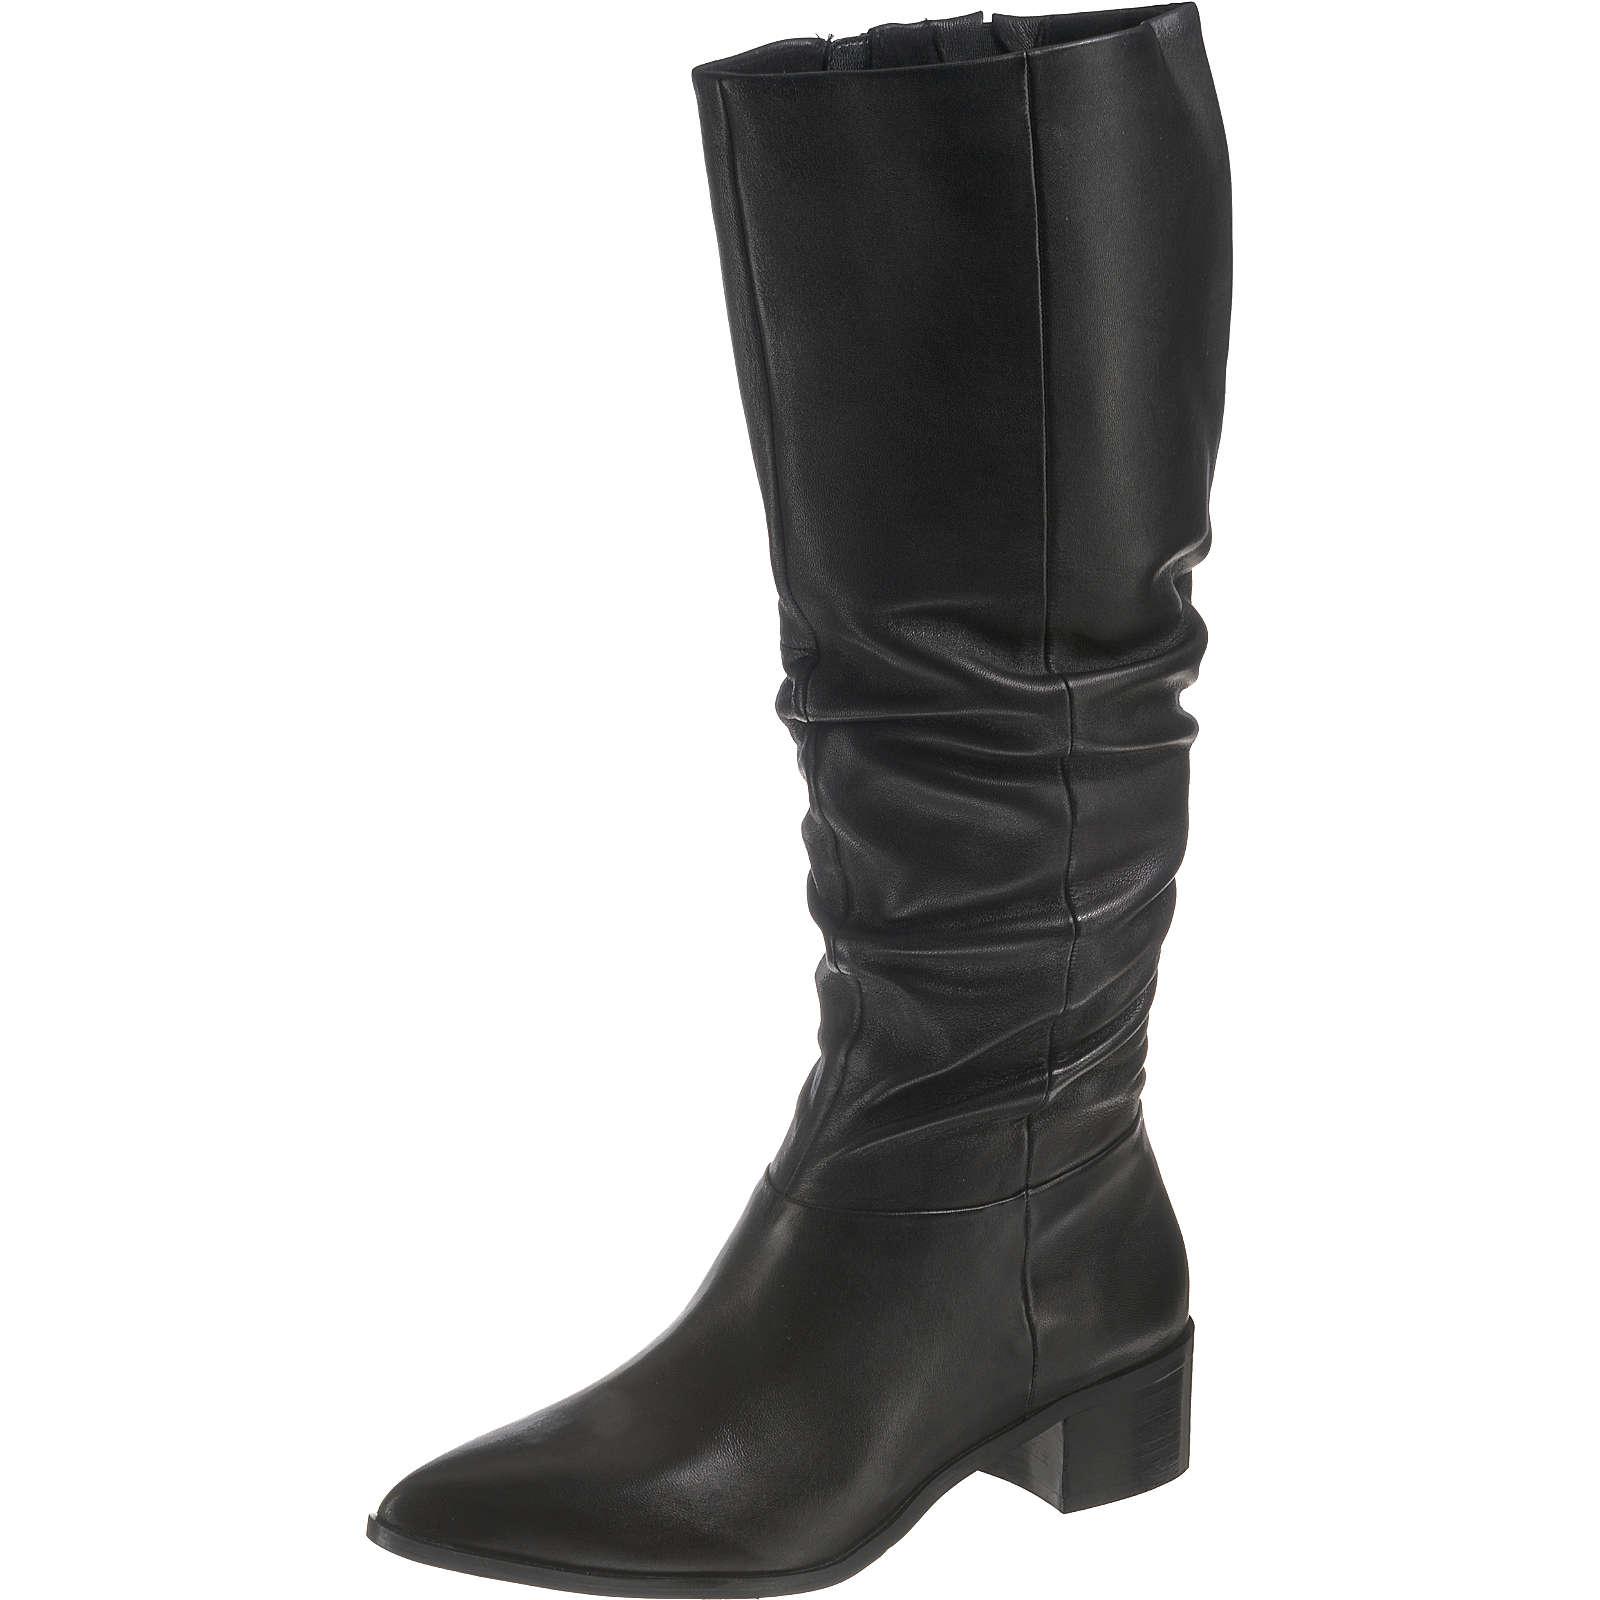 SPM Klassische Stiefel schwarz Damen Gr. 38